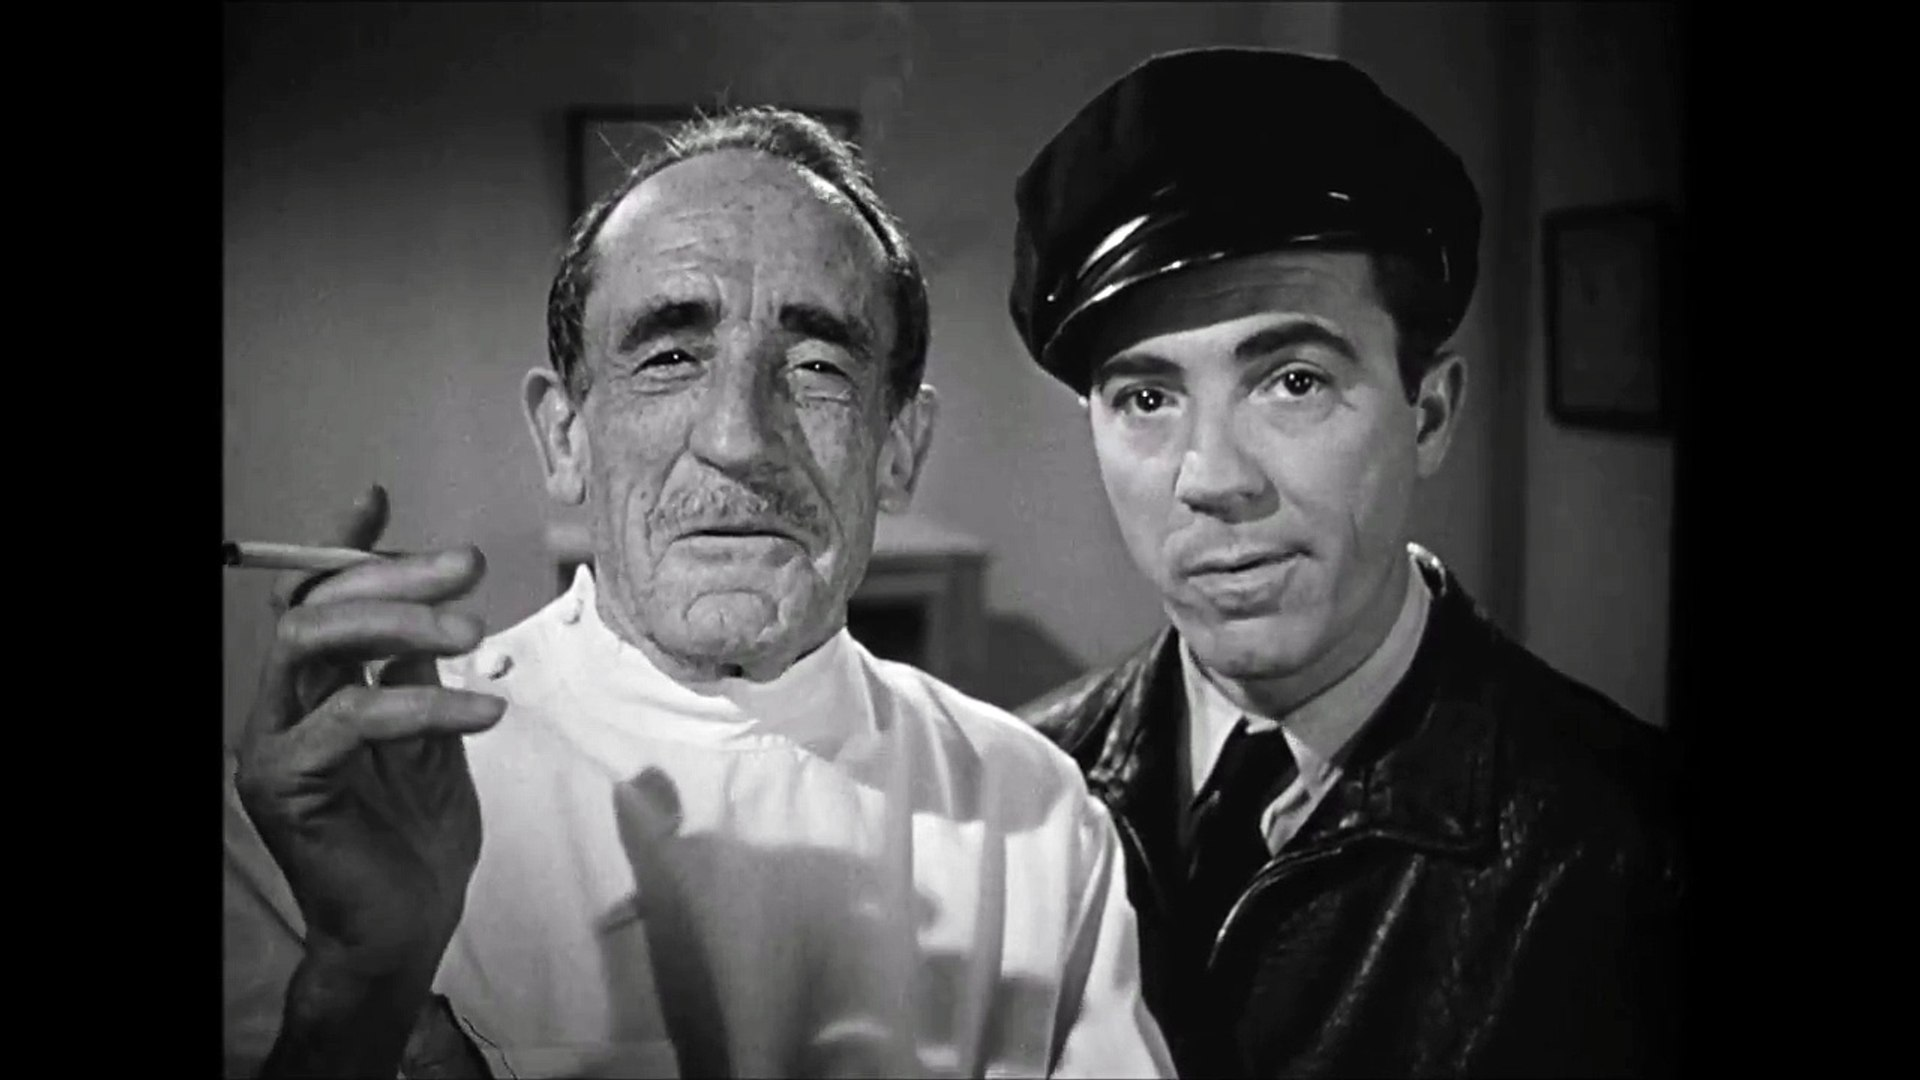 Humphrey Bogart dark passage botched plastic job.with Houseley Stevenson.